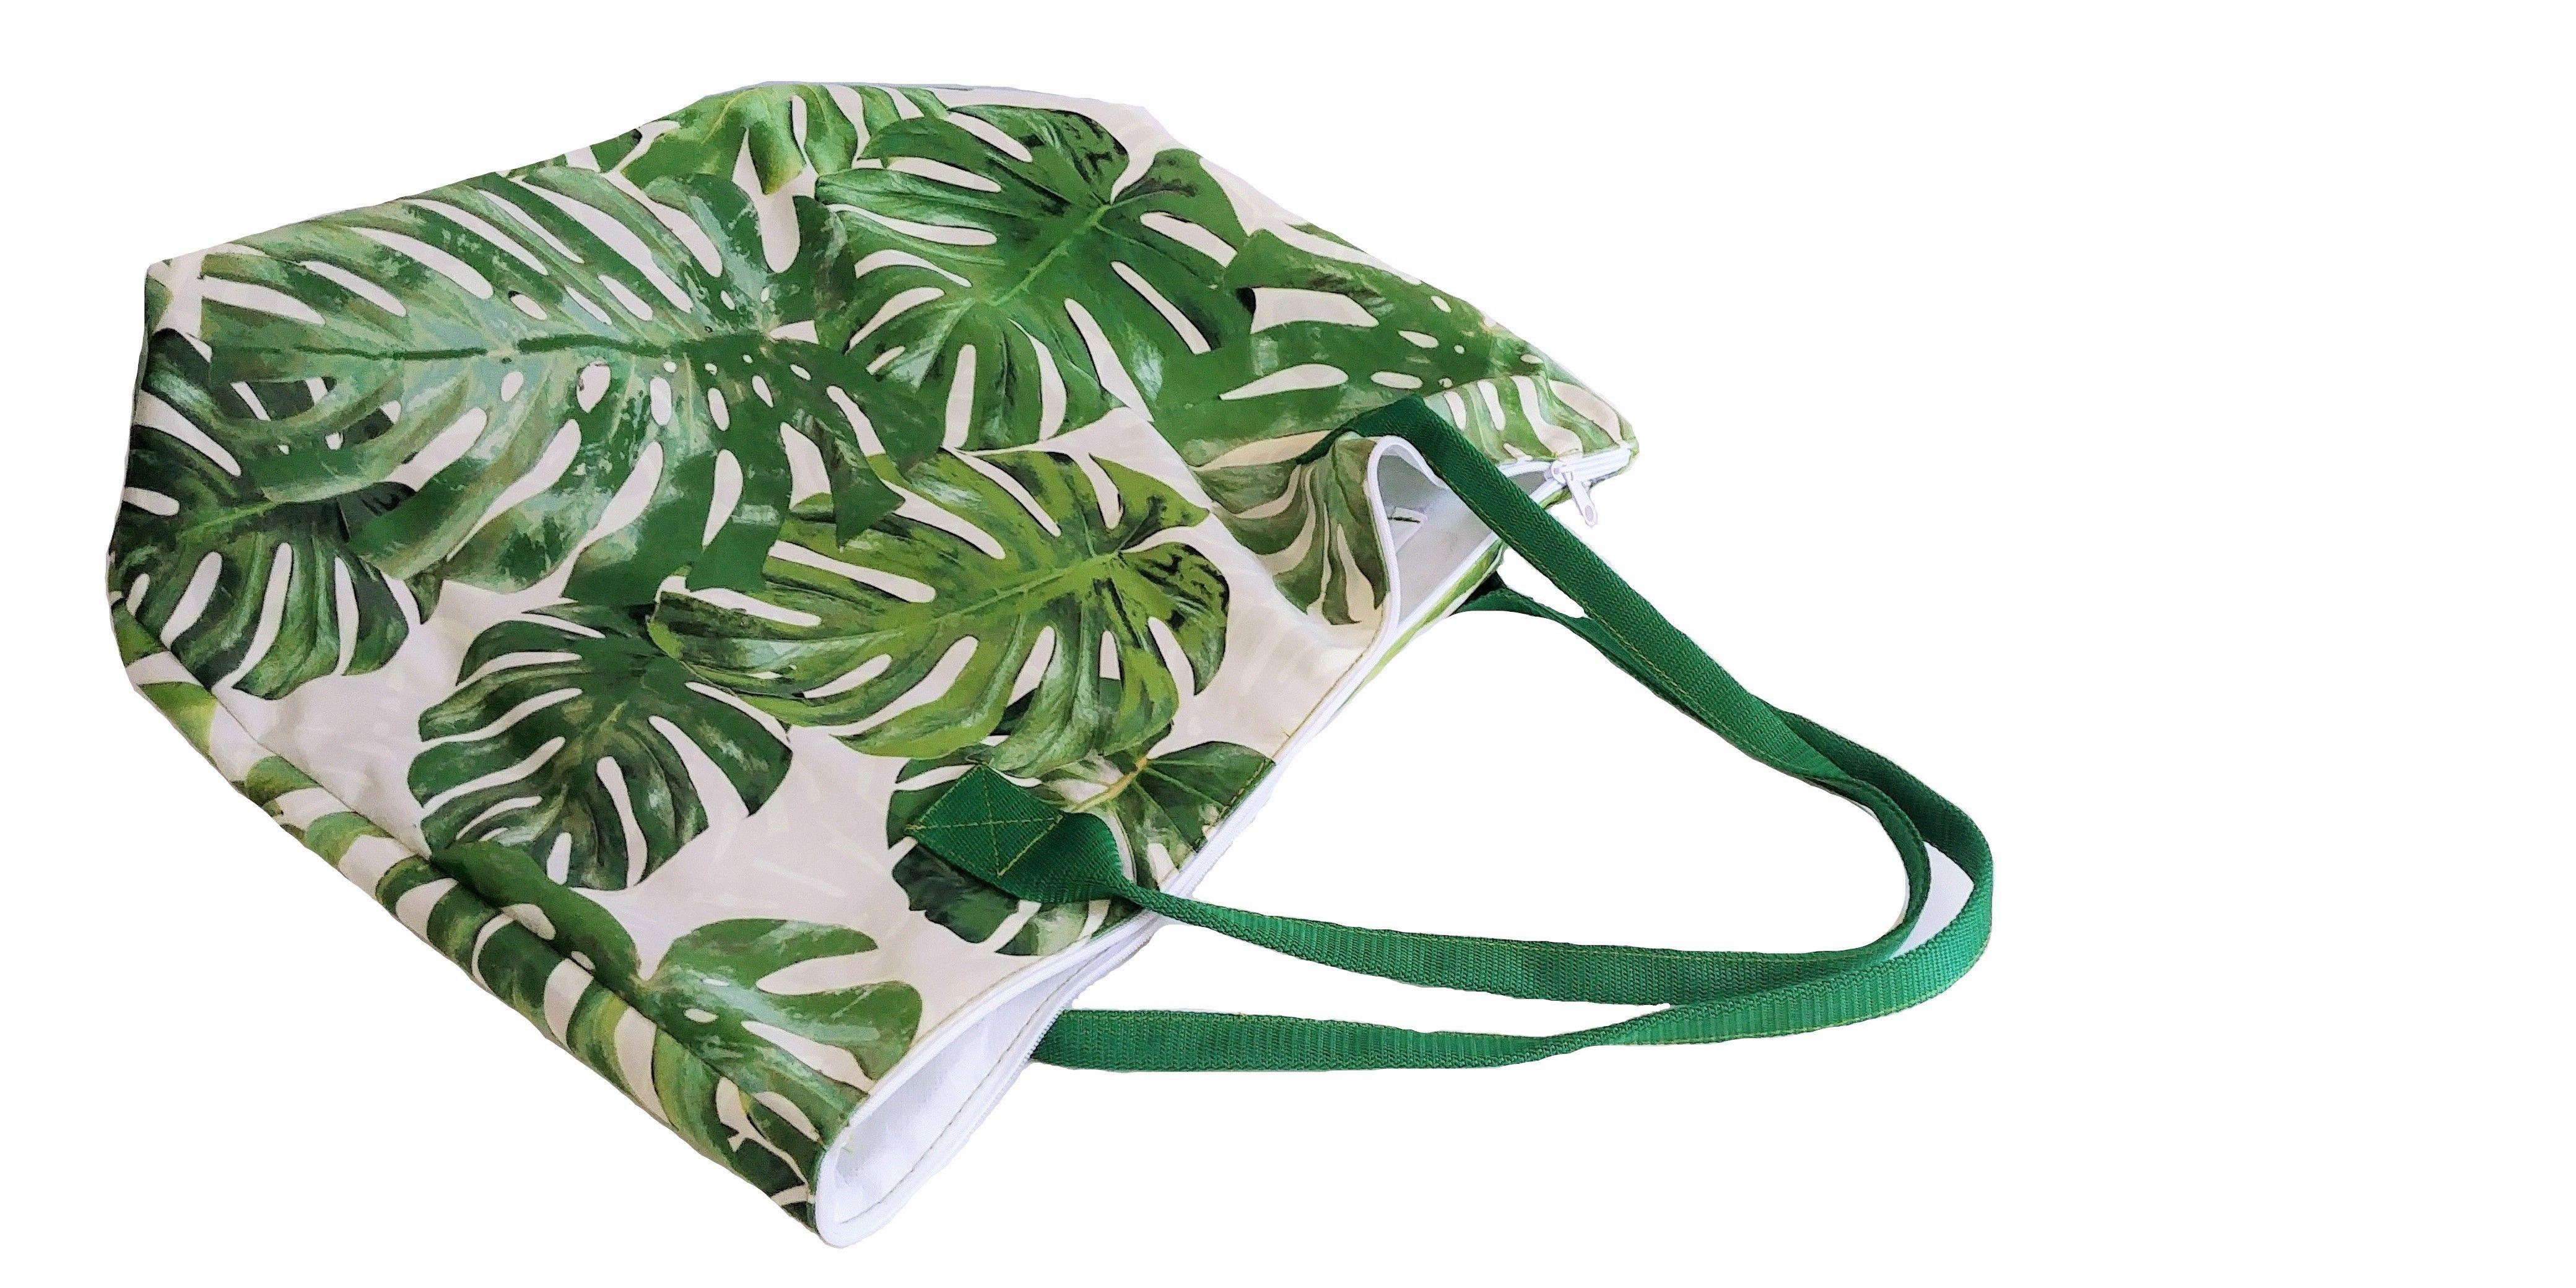 Torba Ekologiczna Duza Liscie Monstery Bags Drawstring Backpack Backpacks